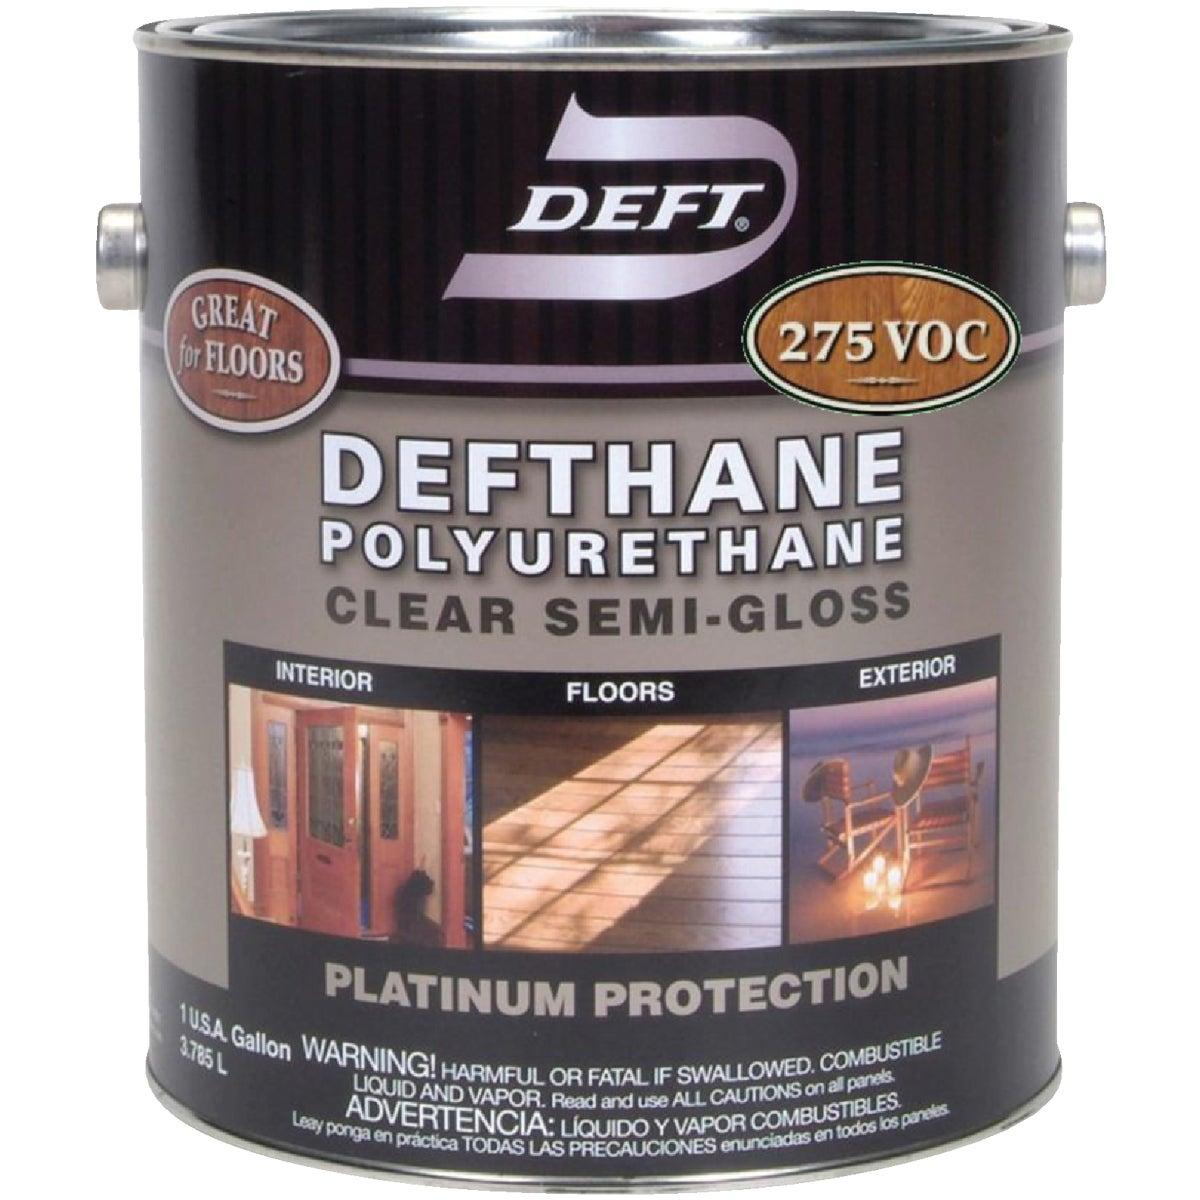 GAL VOC S/G DEFTHANE - DFT123/01 by Deft